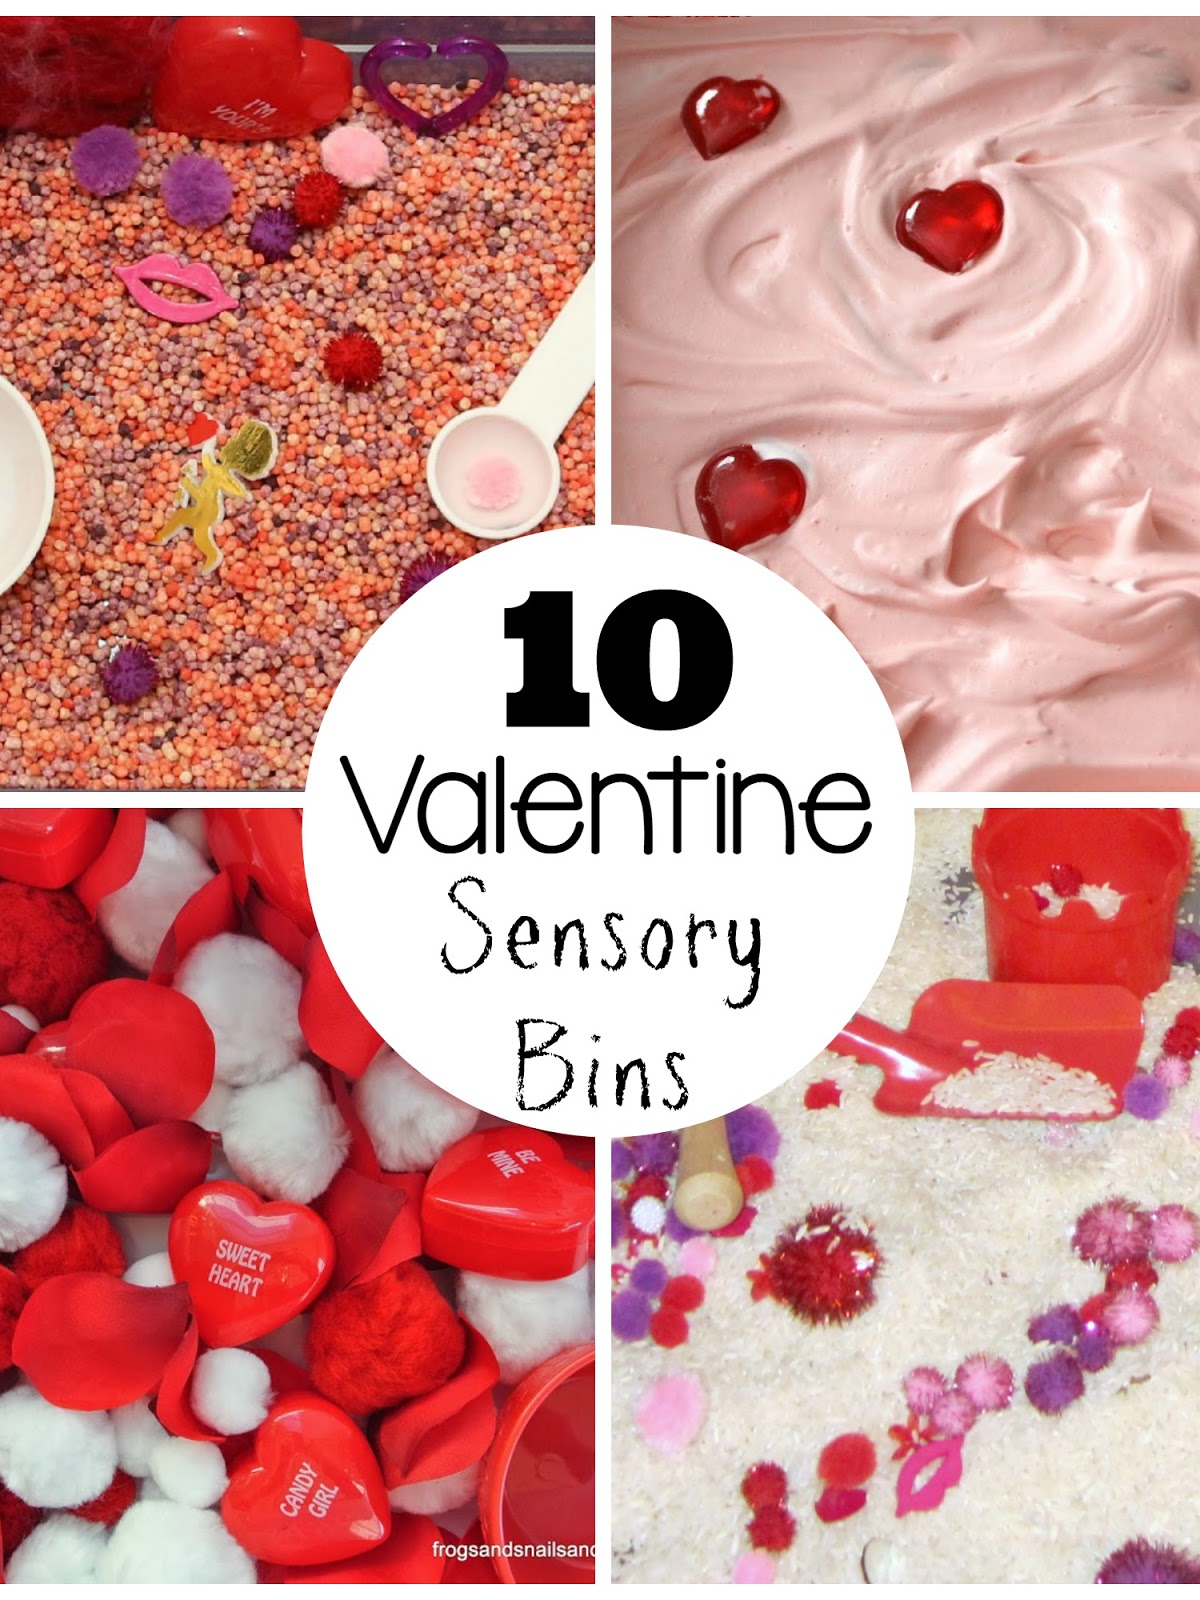 Valentines By Kylie Cosmetics: Top 10 Valentine's Day Sensory Bins